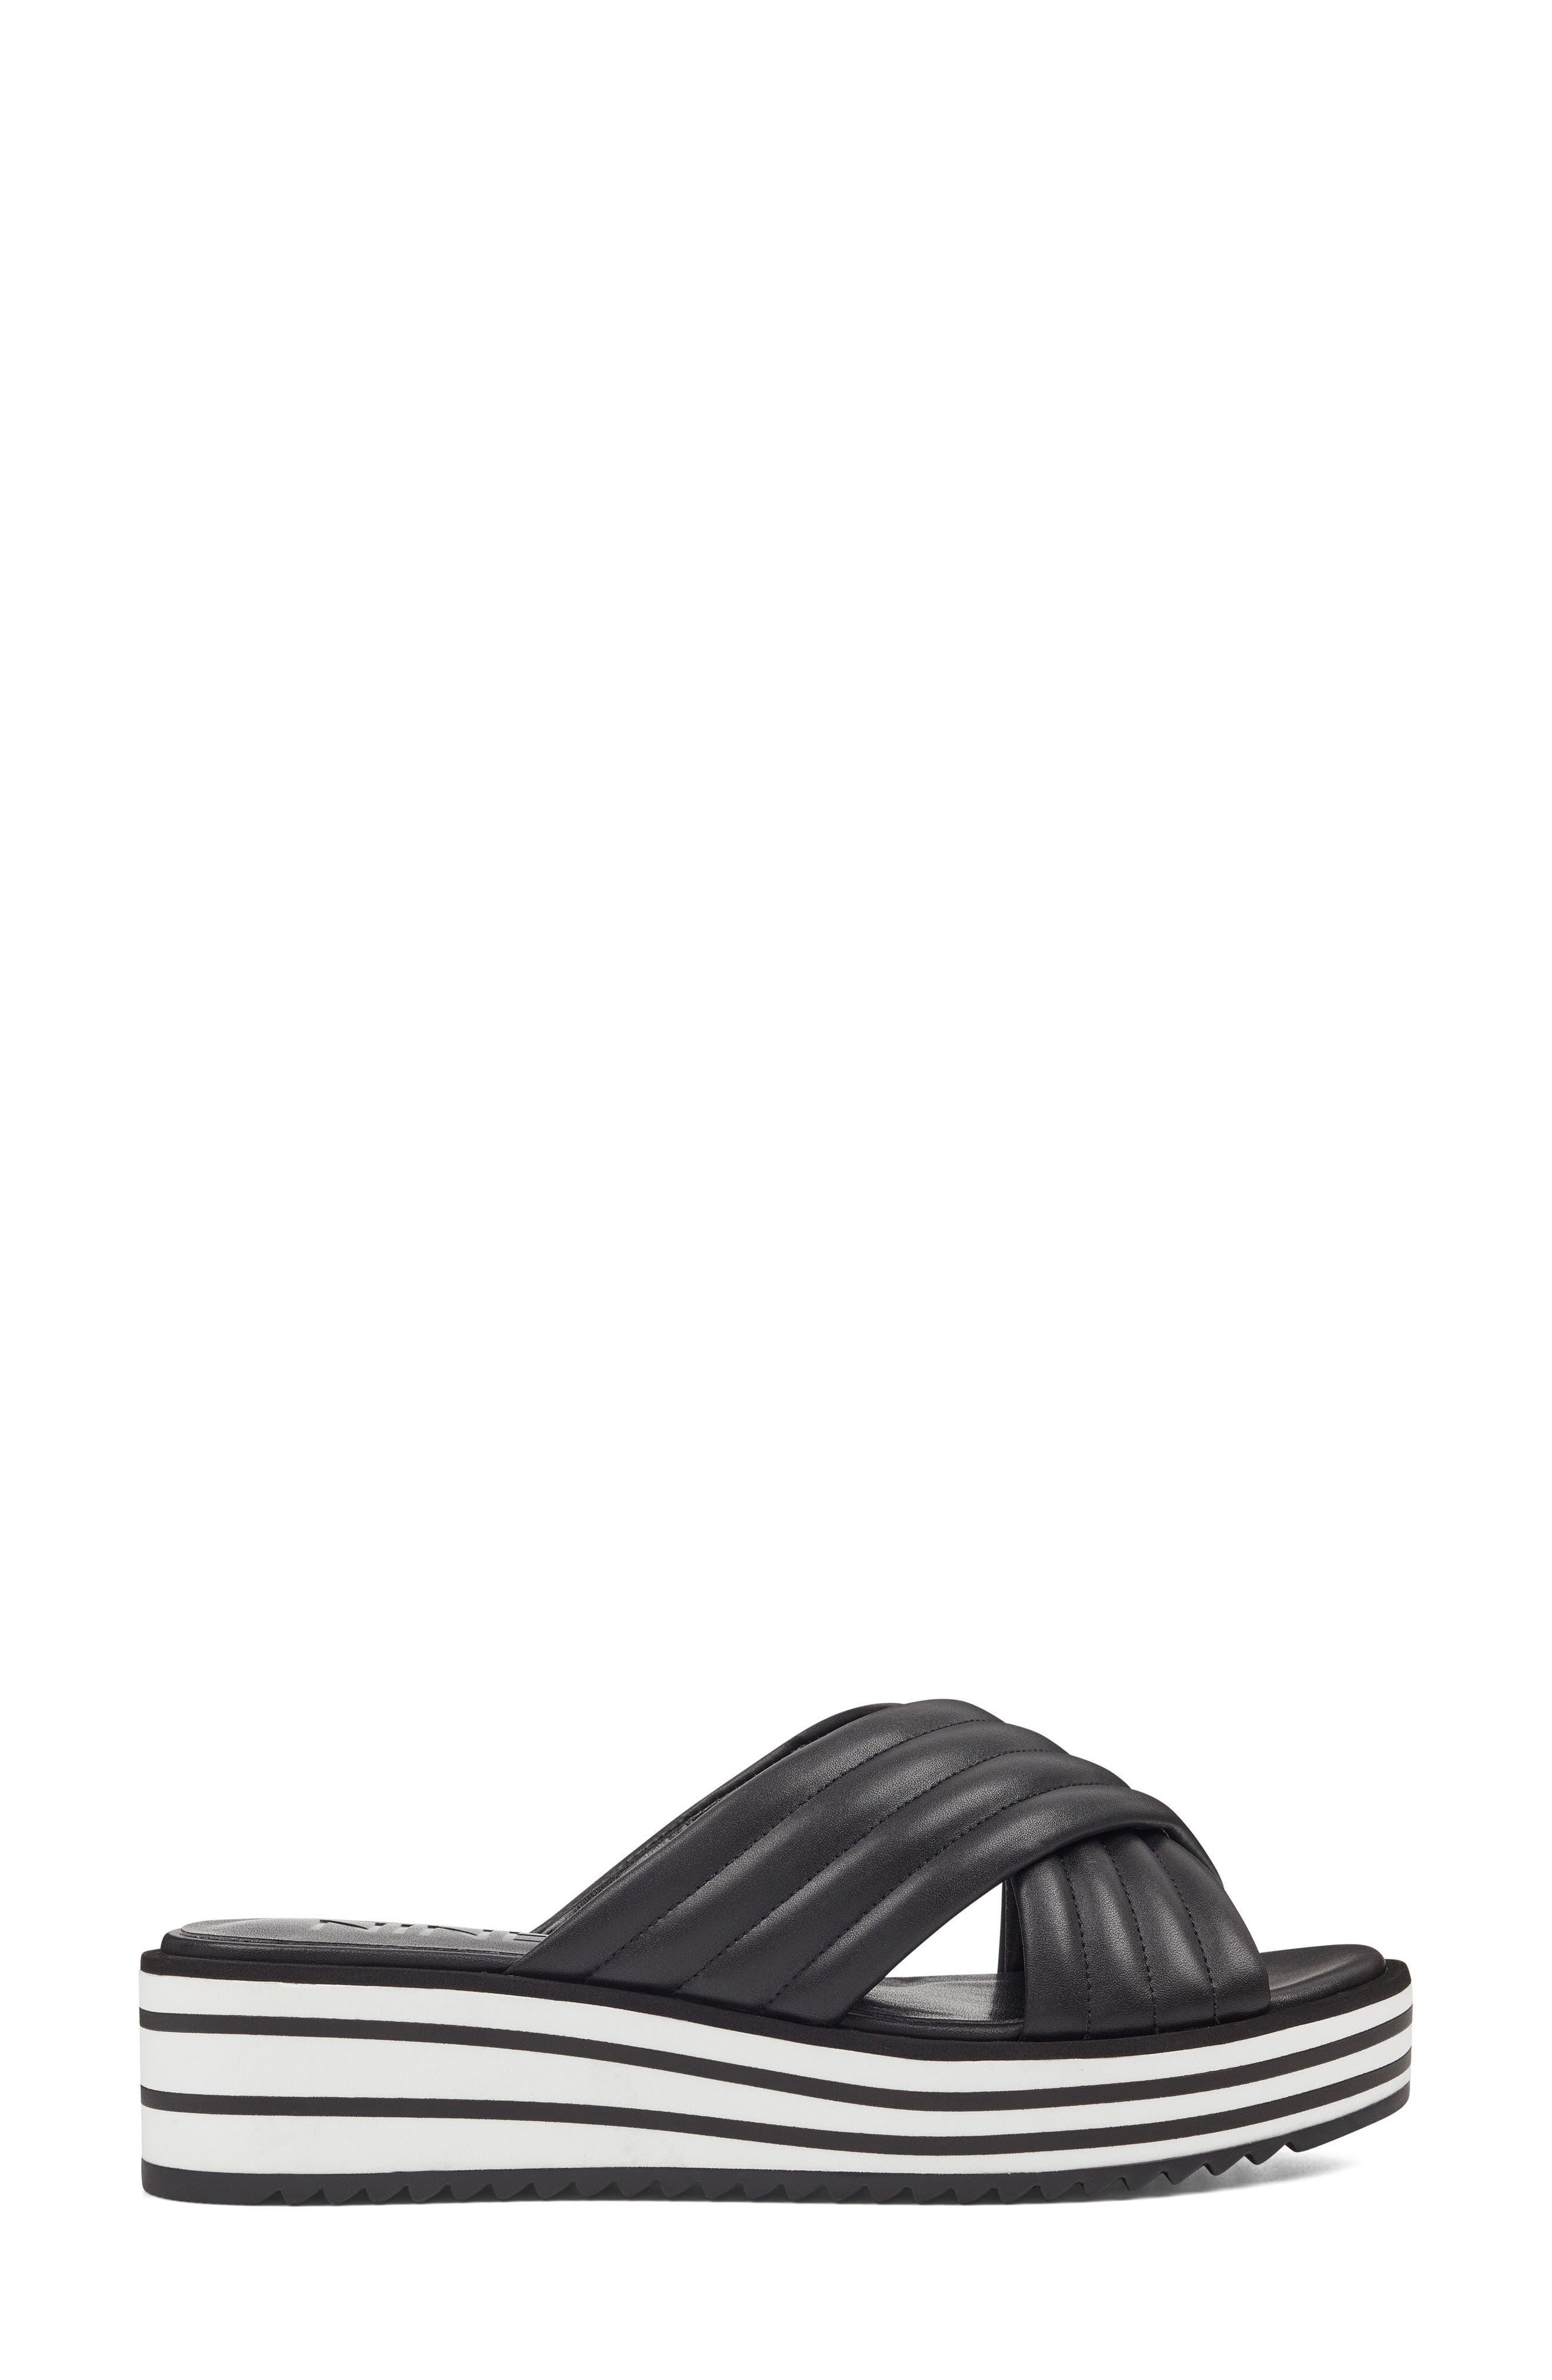 Zonita Platform Slide Sandal,                             Alternate thumbnail 3, color,                             001